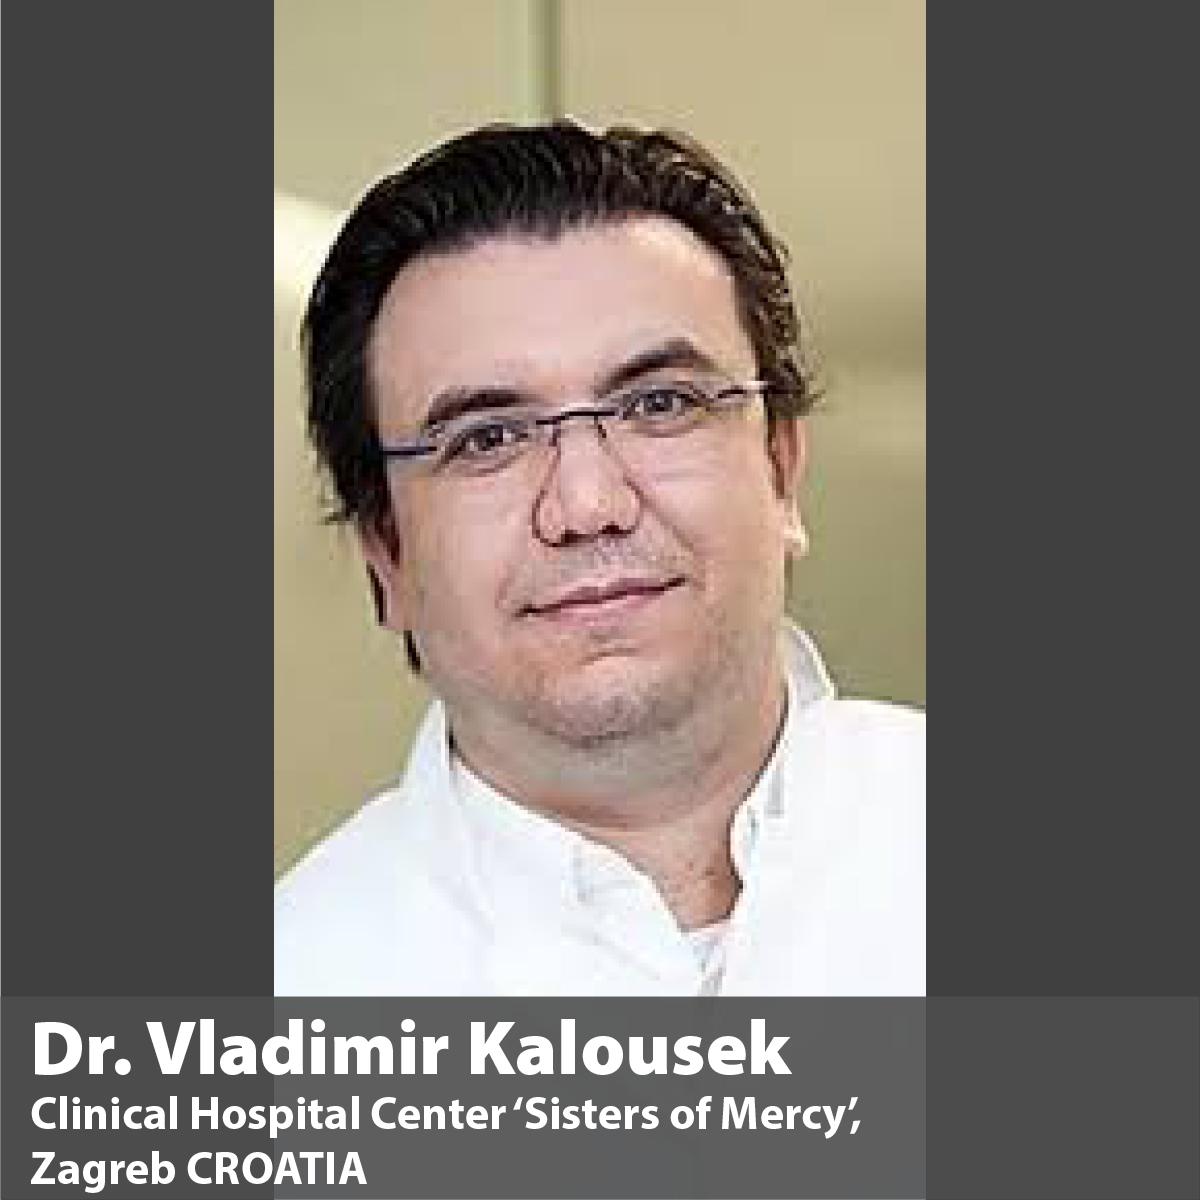 Mentor Dr. Vladimir Kalousek